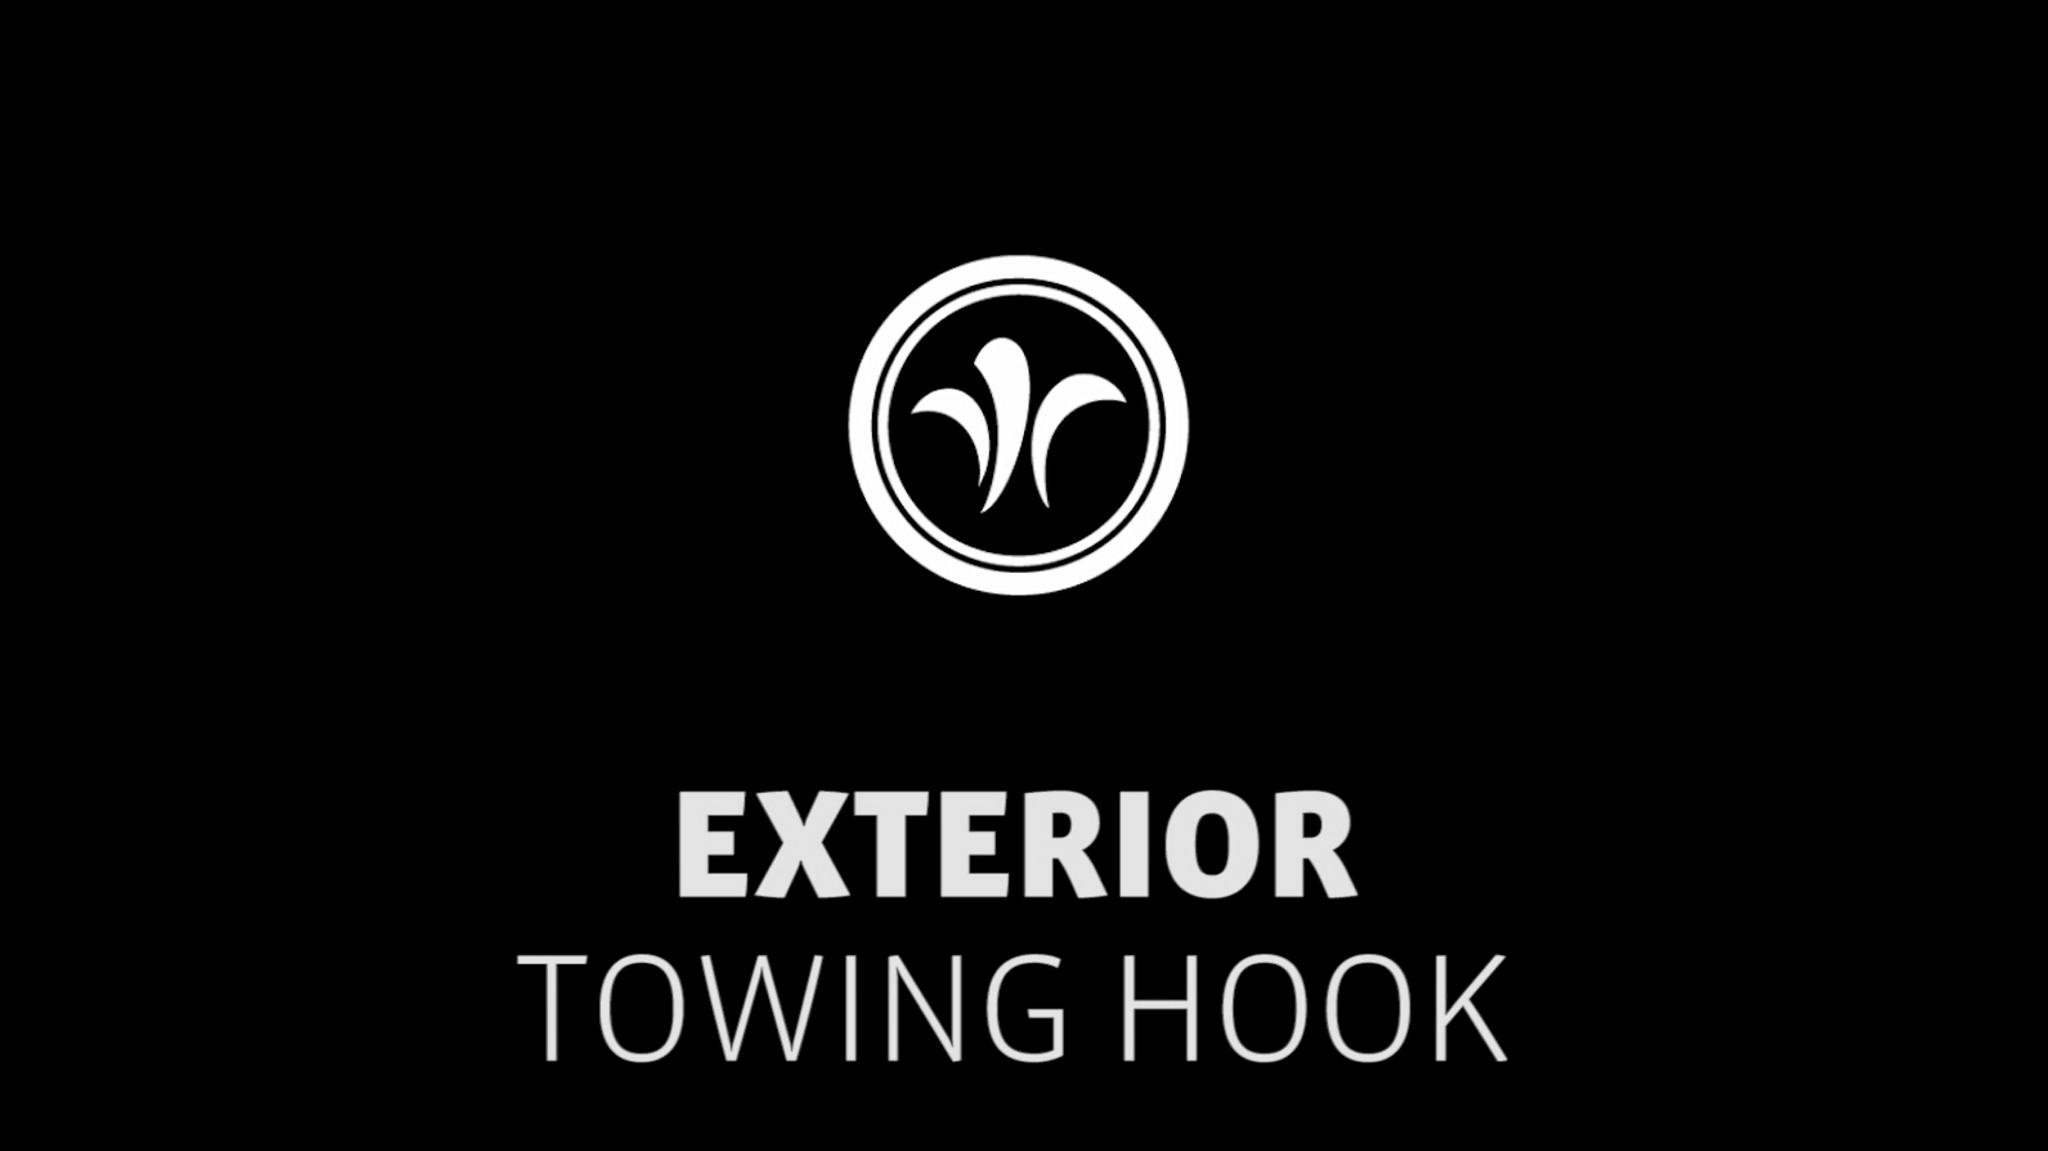 motorhome towing hook // niesmann+bischoff - camper (model ARTO) // 2019 // EX6